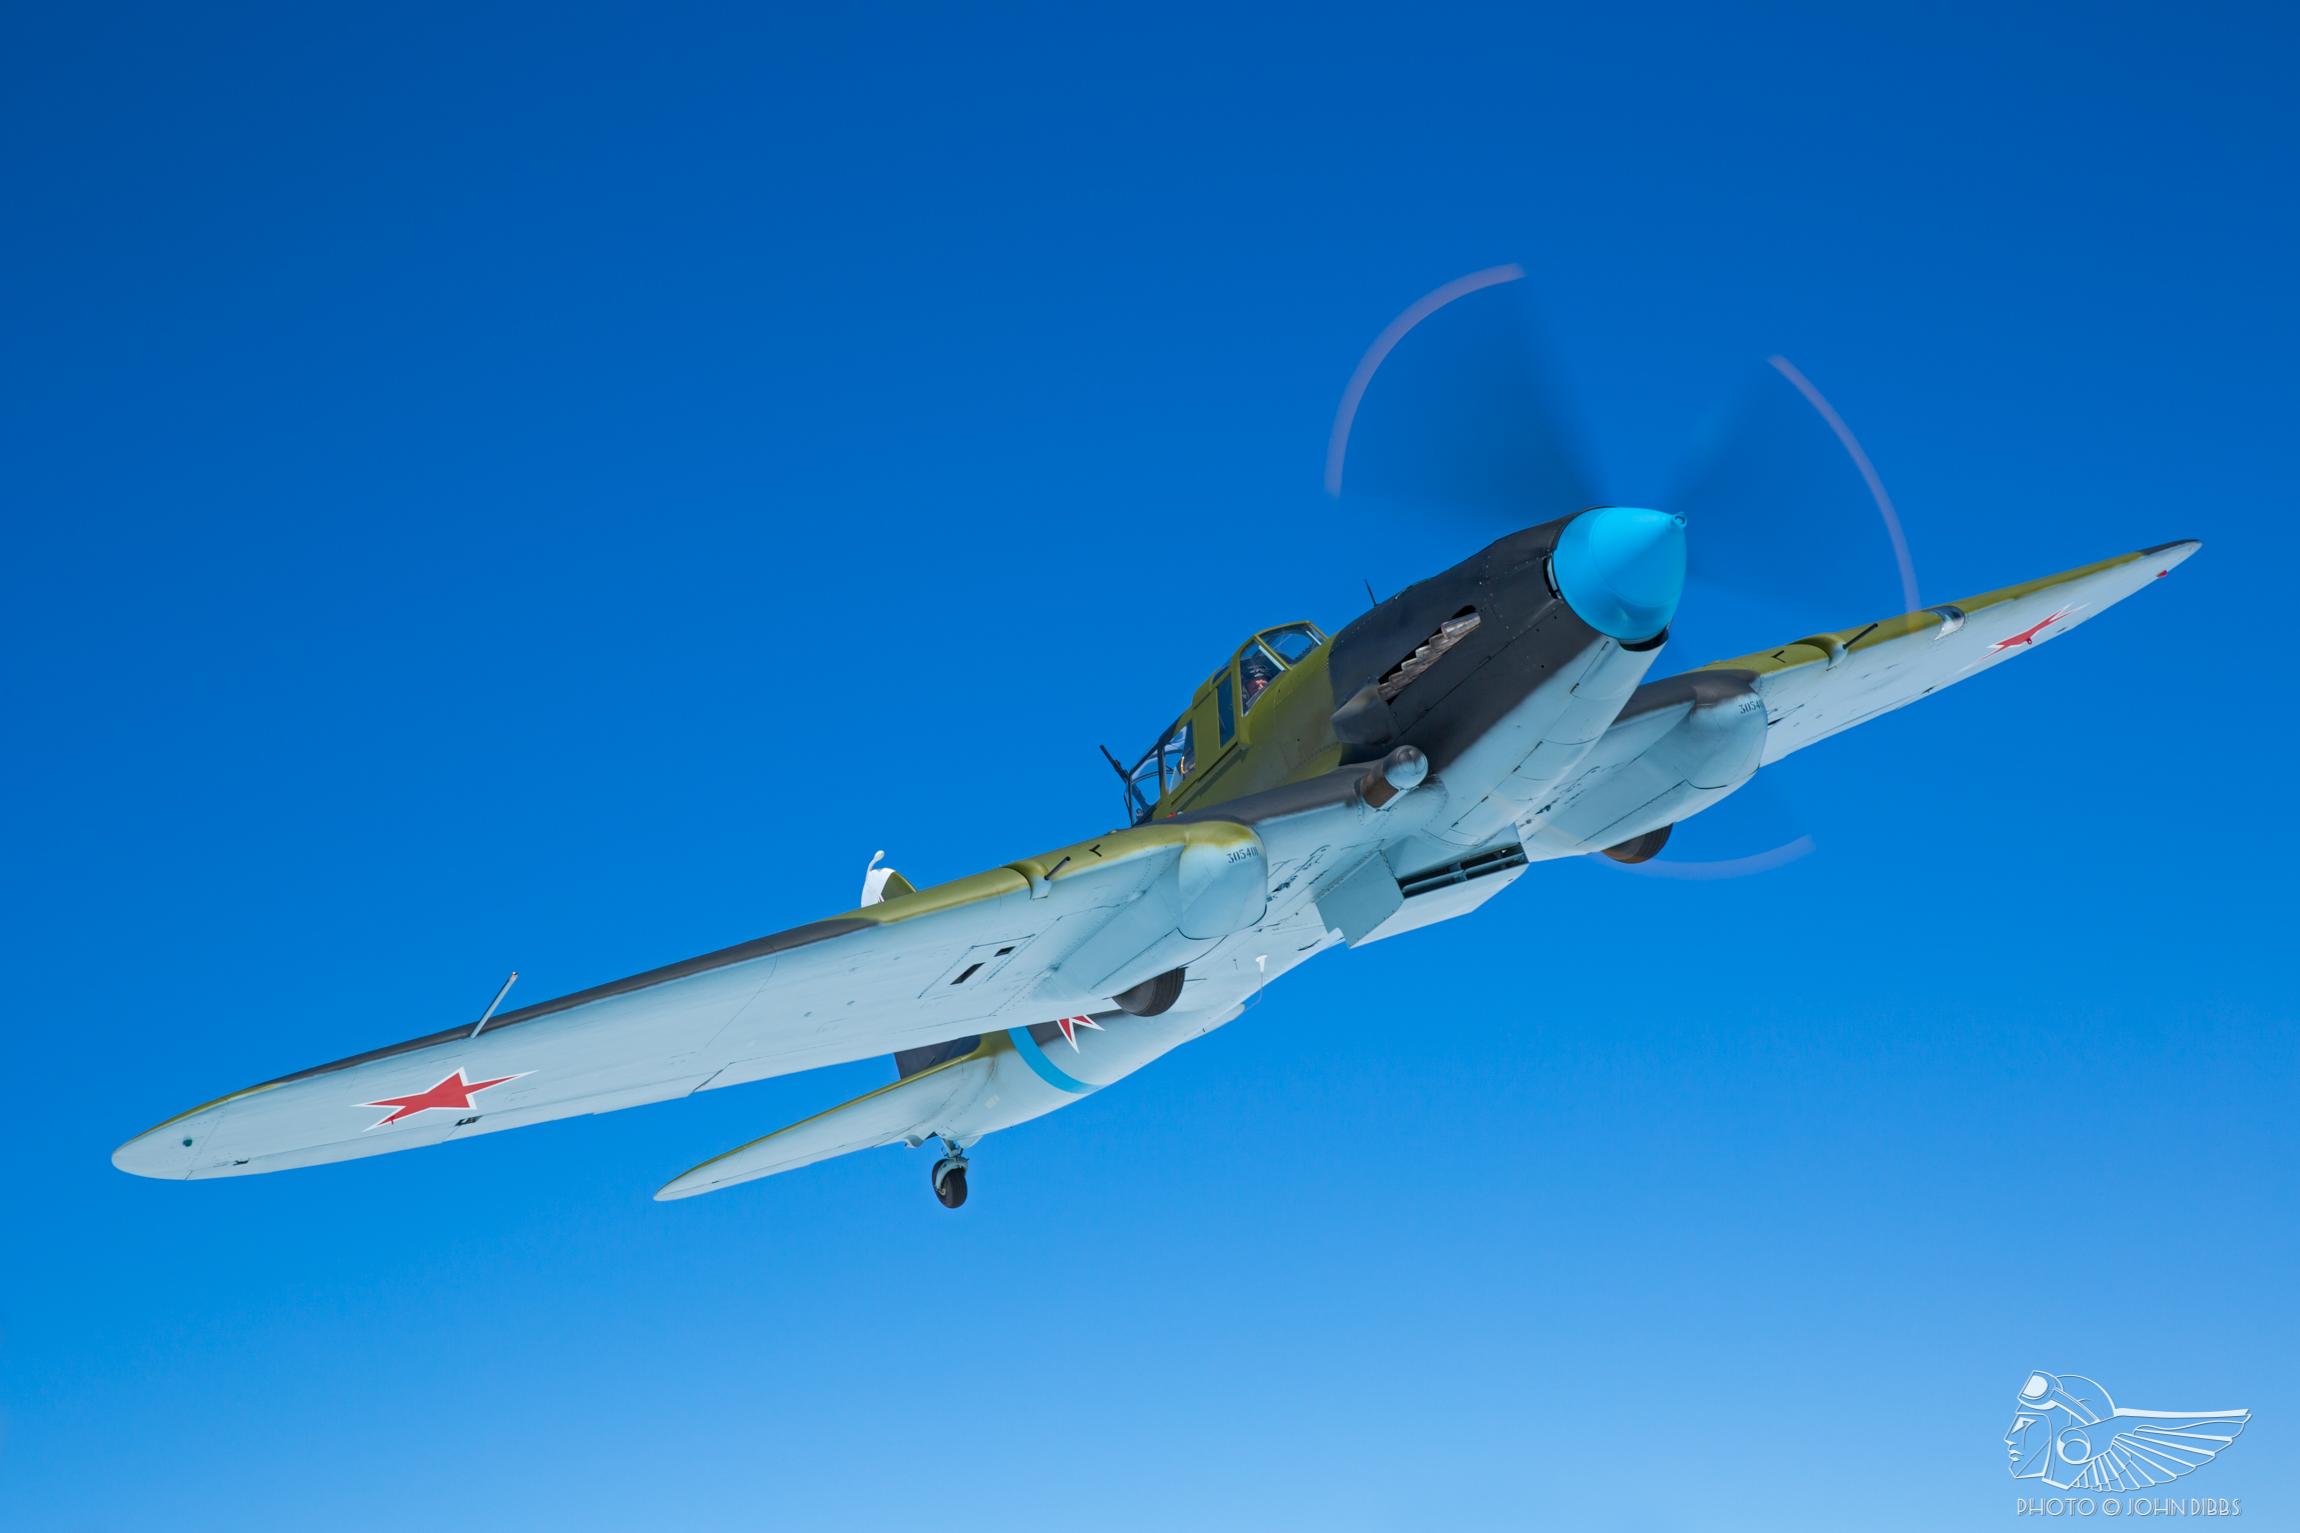 Modern impressions of the legendary IL-2 Sturmovik | The Vintage